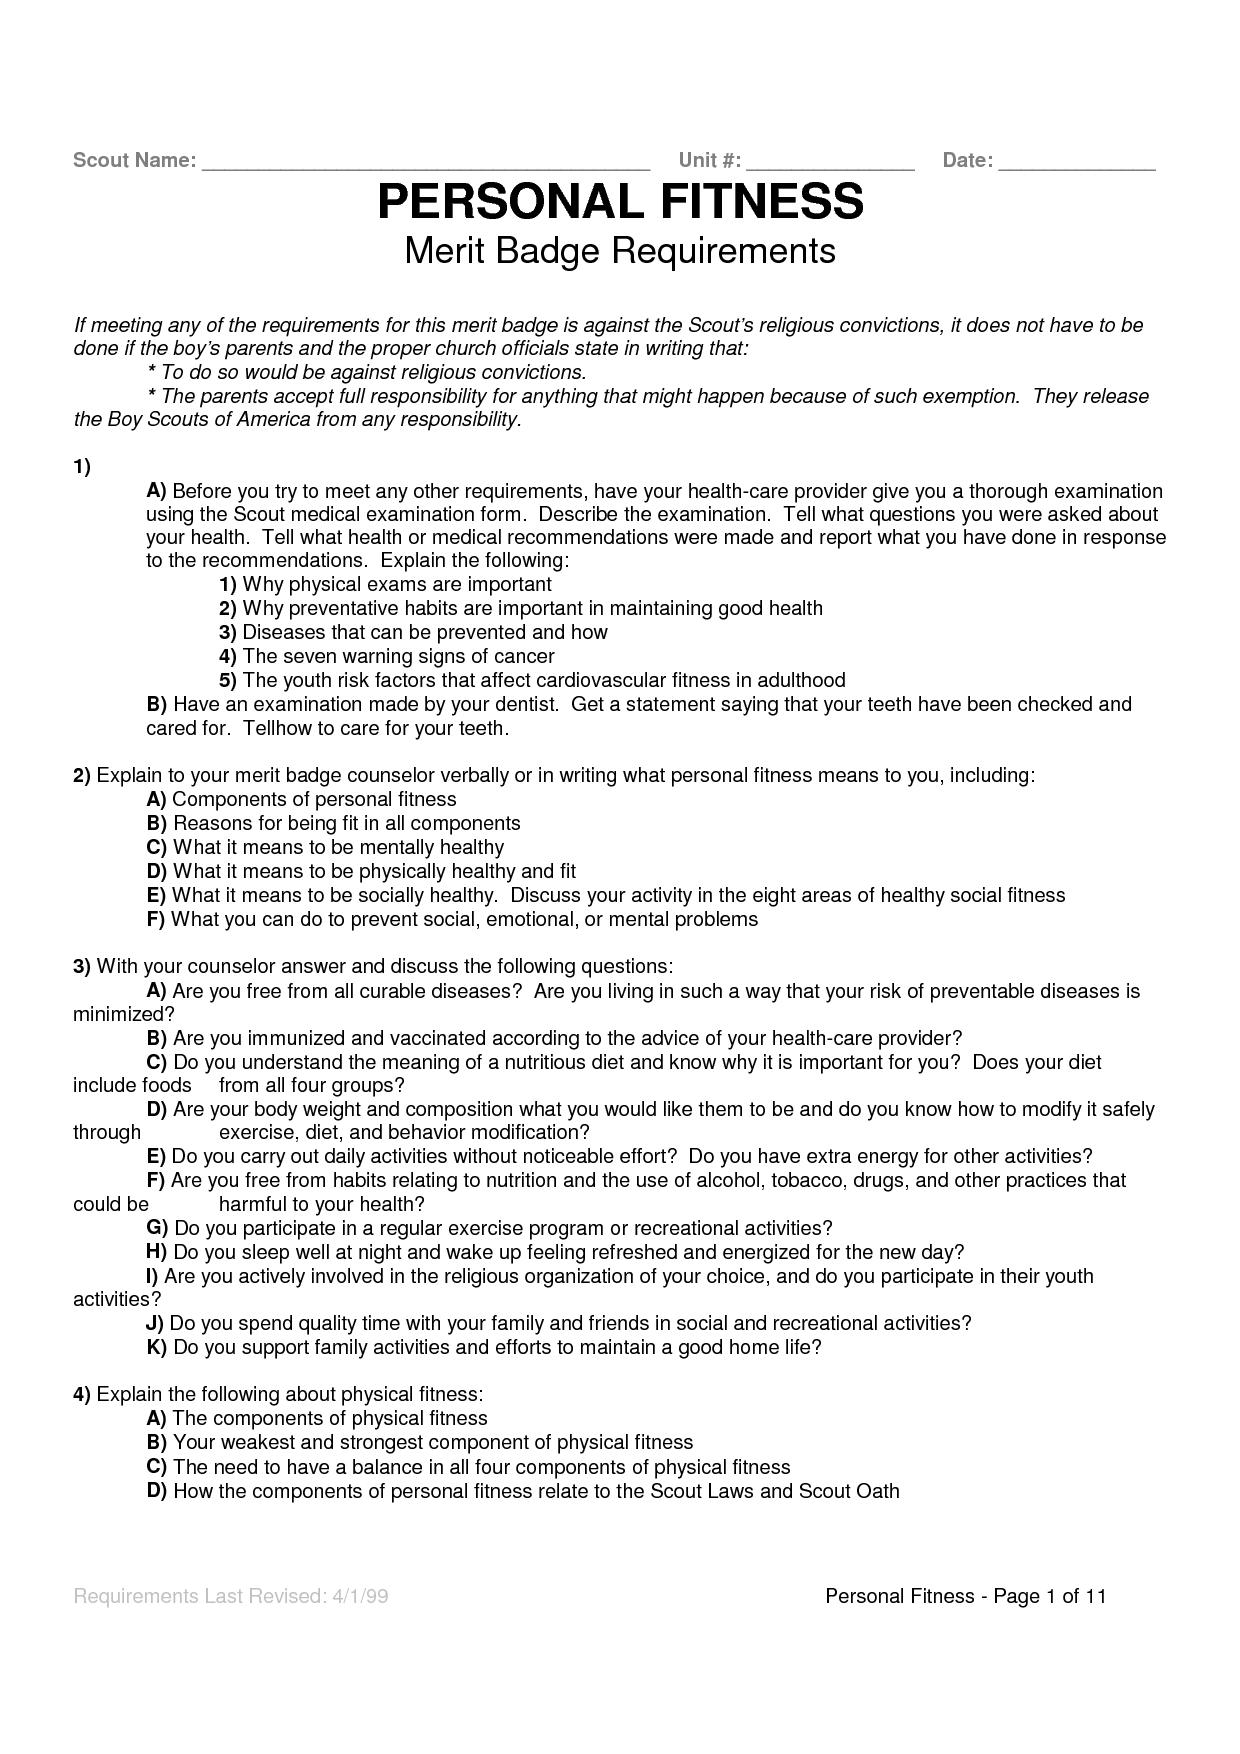 Personal Fitness Worksheet